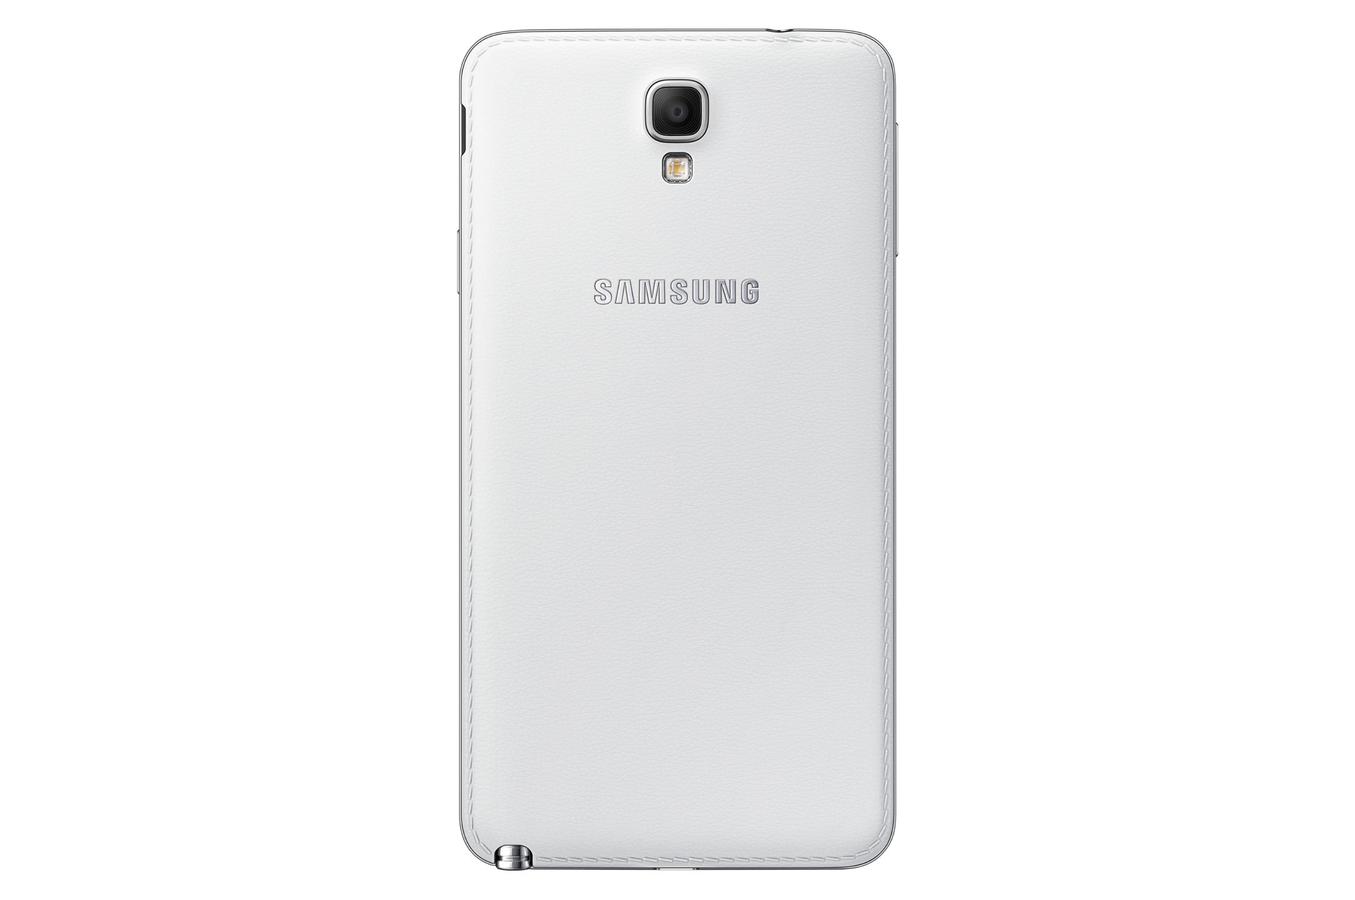 smartphone samsung galaxy note 3 lite blanc galaxy note 3 lite 4016254 darty. Black Bedroom Furniture Sets. Home Design Ideas